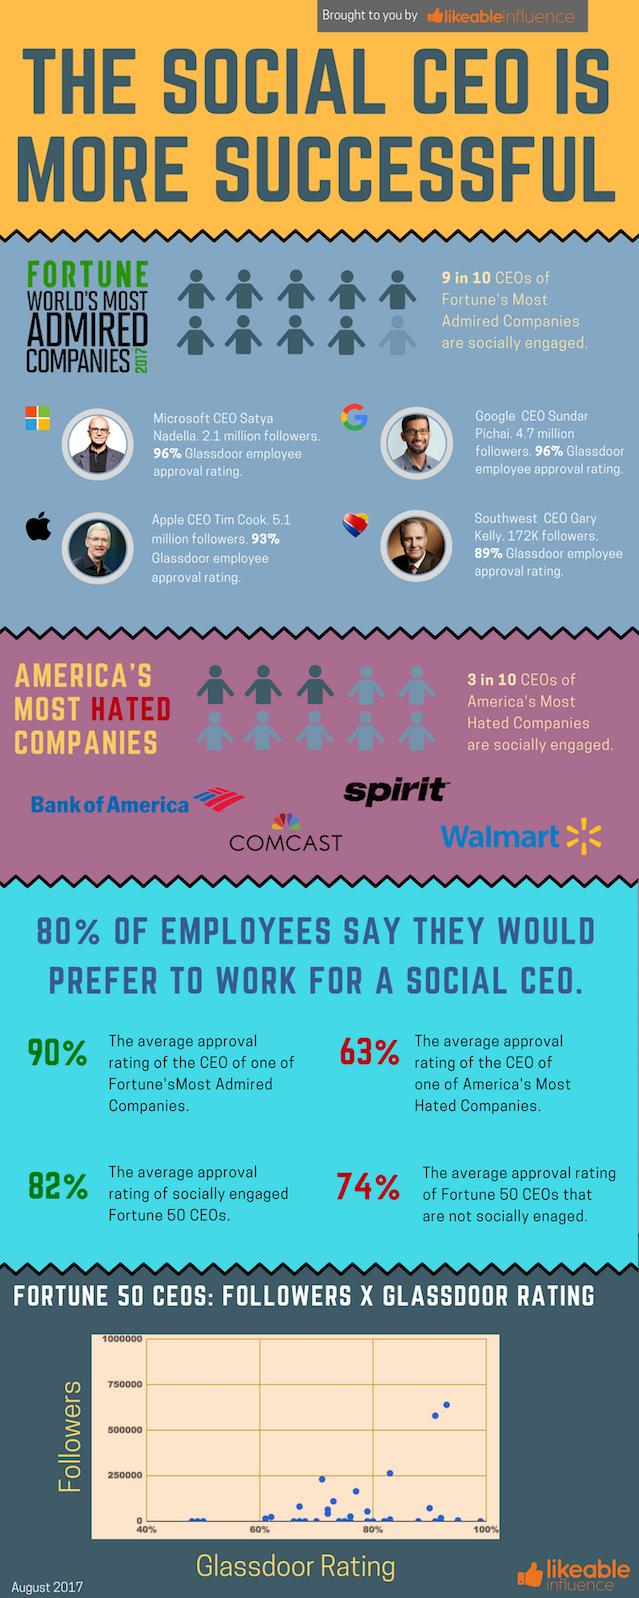 Should companies embrace social media